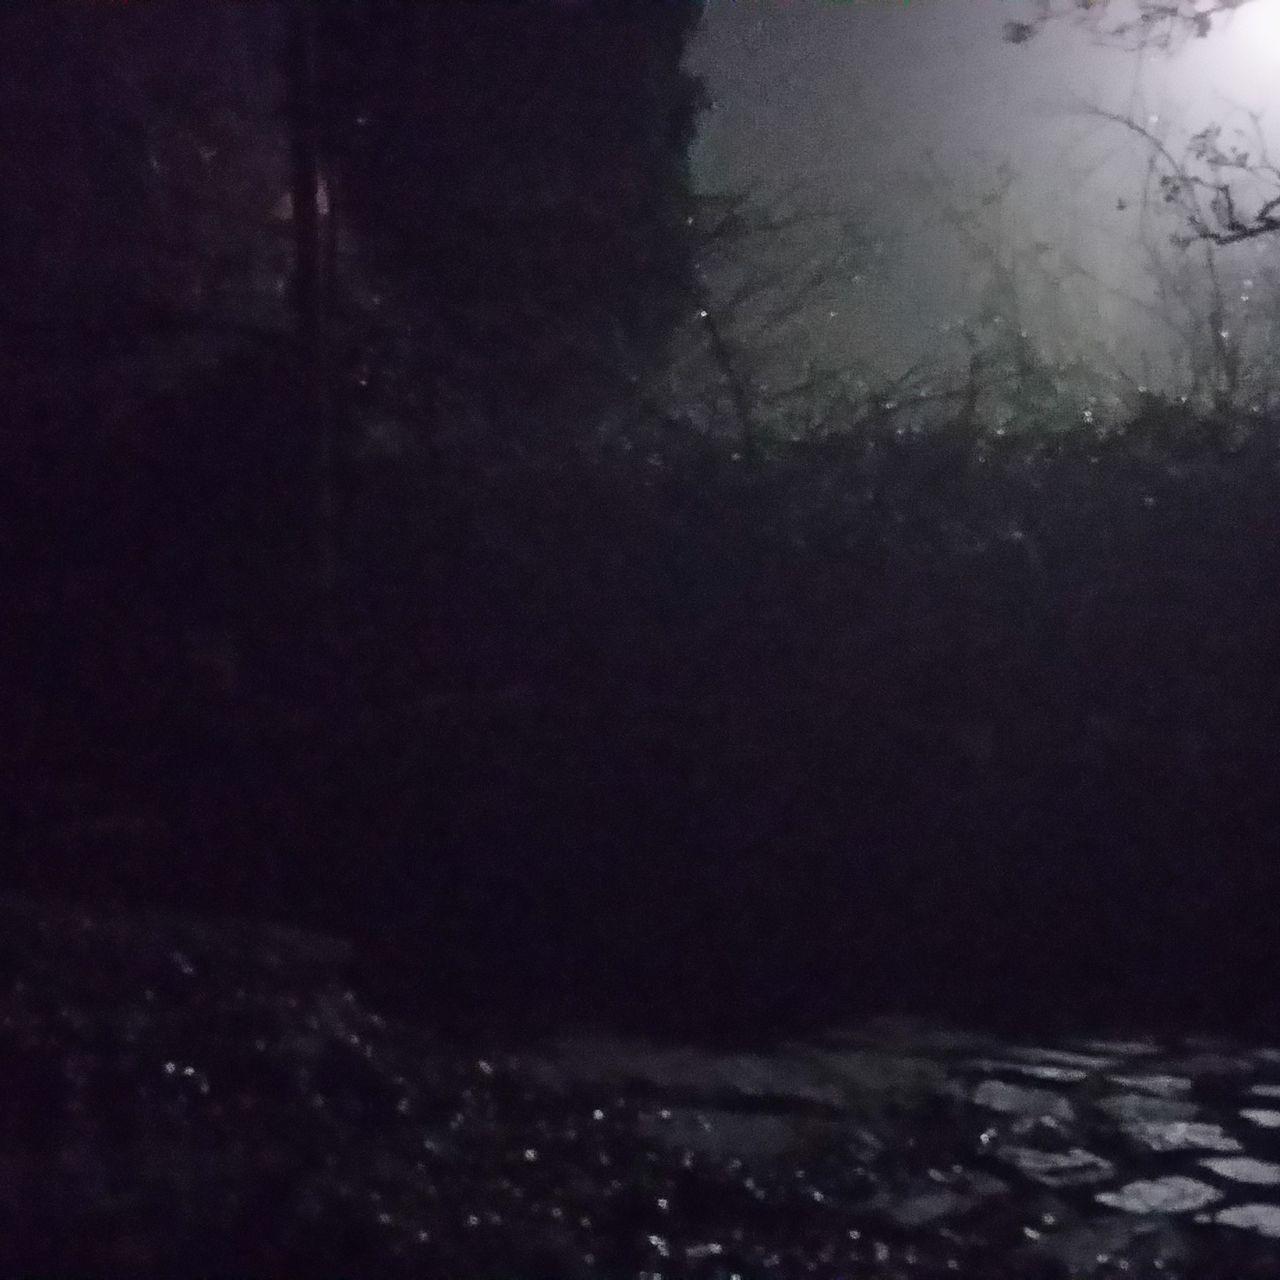 night, no people, water, indoors, close-up, nature, sky